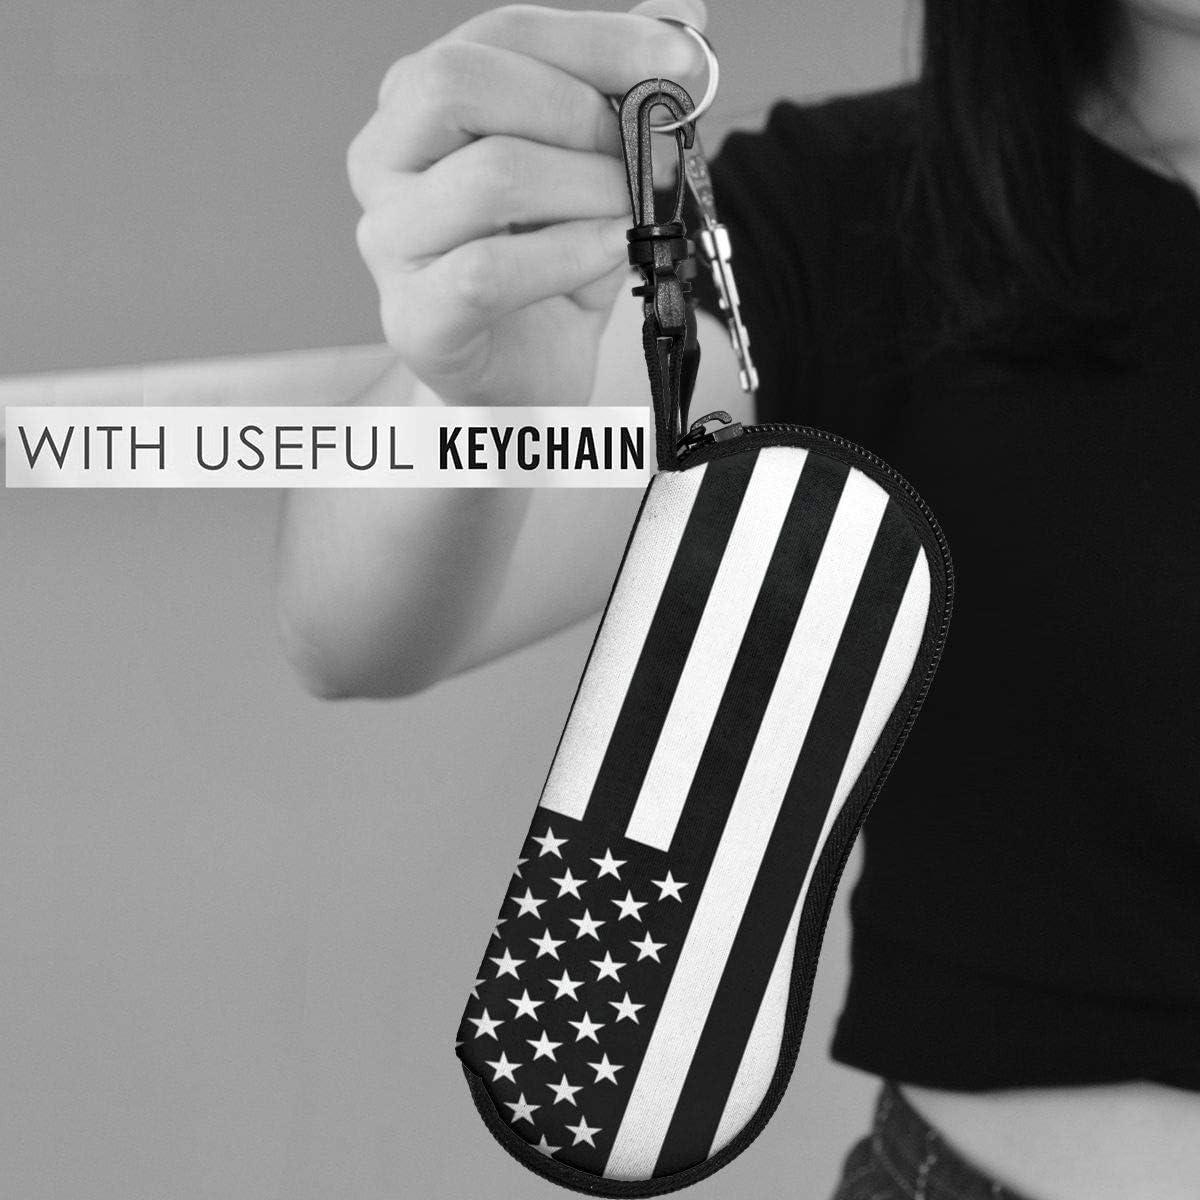 Black And White American Flag Sunglasses Soft Case Ultra Light Neoprene Zipper Eyeglass Case With Key Chain